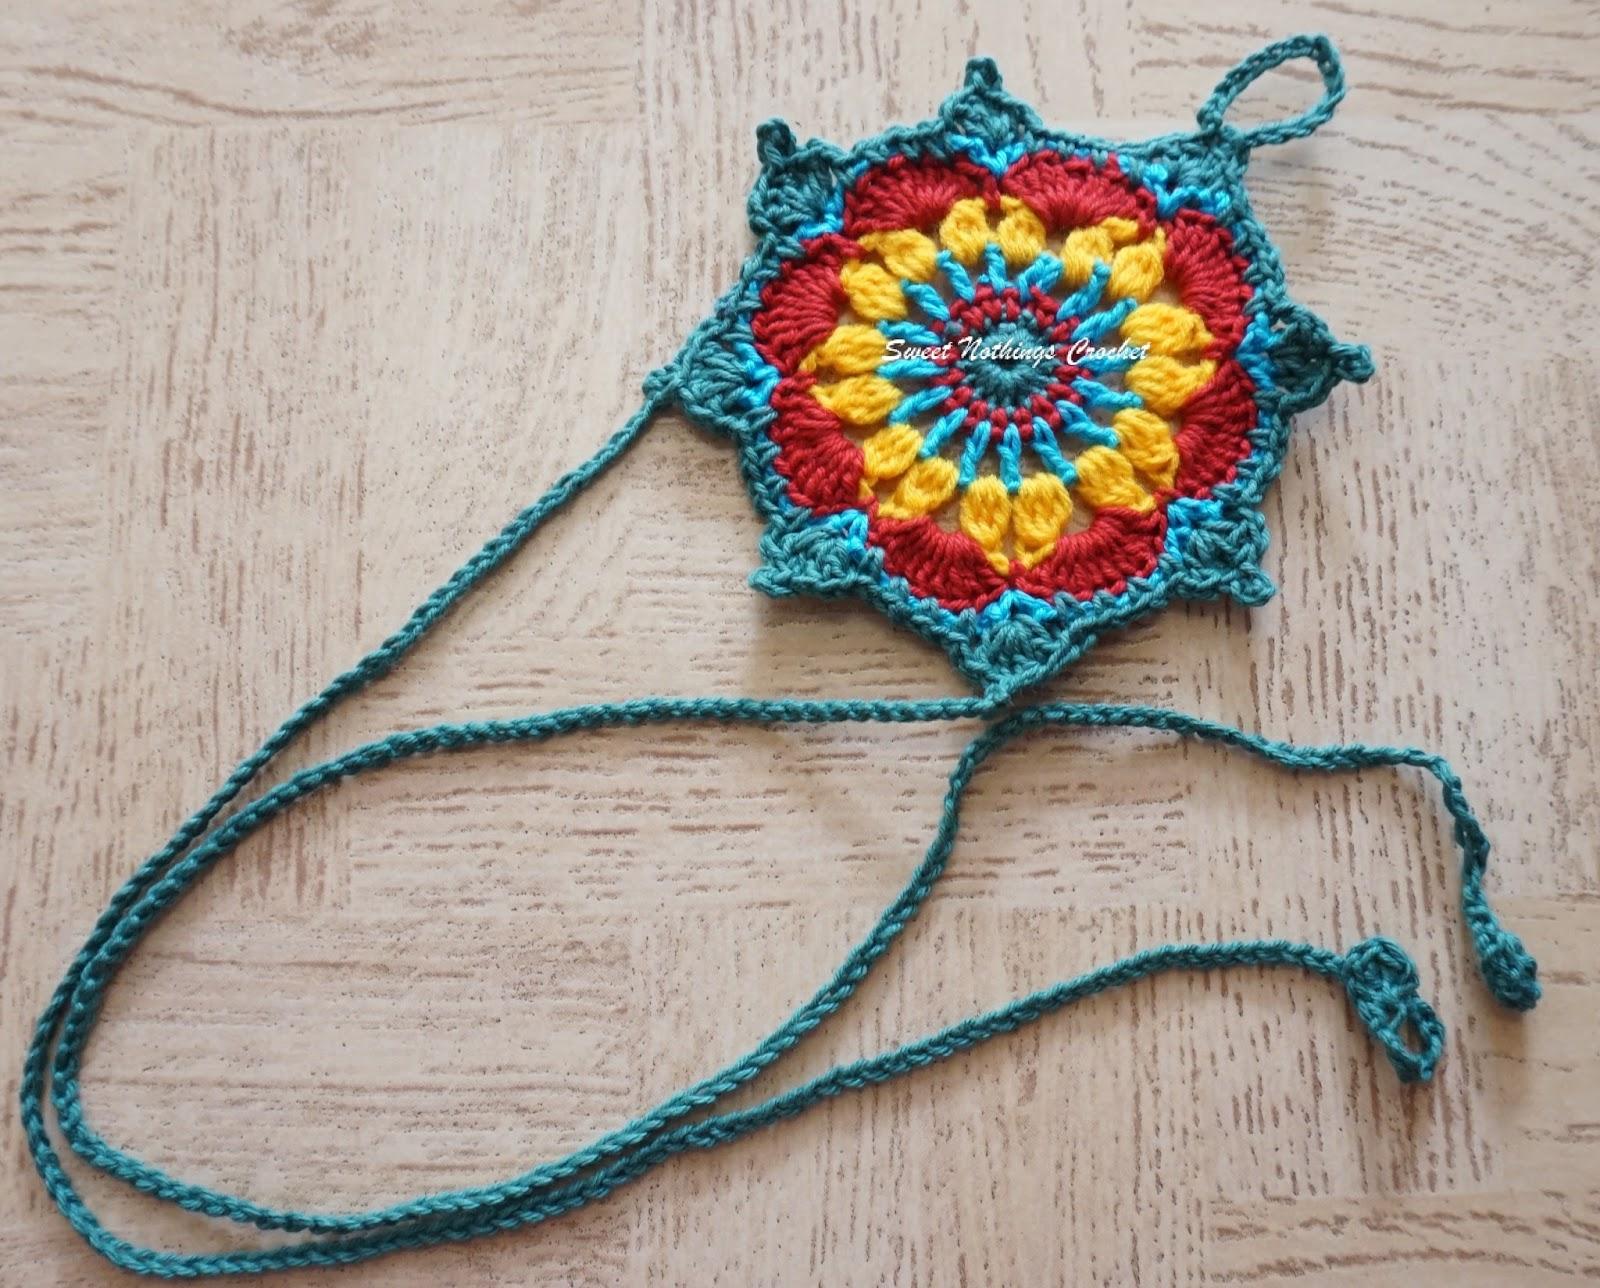 Sweet Nothings Crochet: SPEAR EDGED BAREFOOT SANDALS